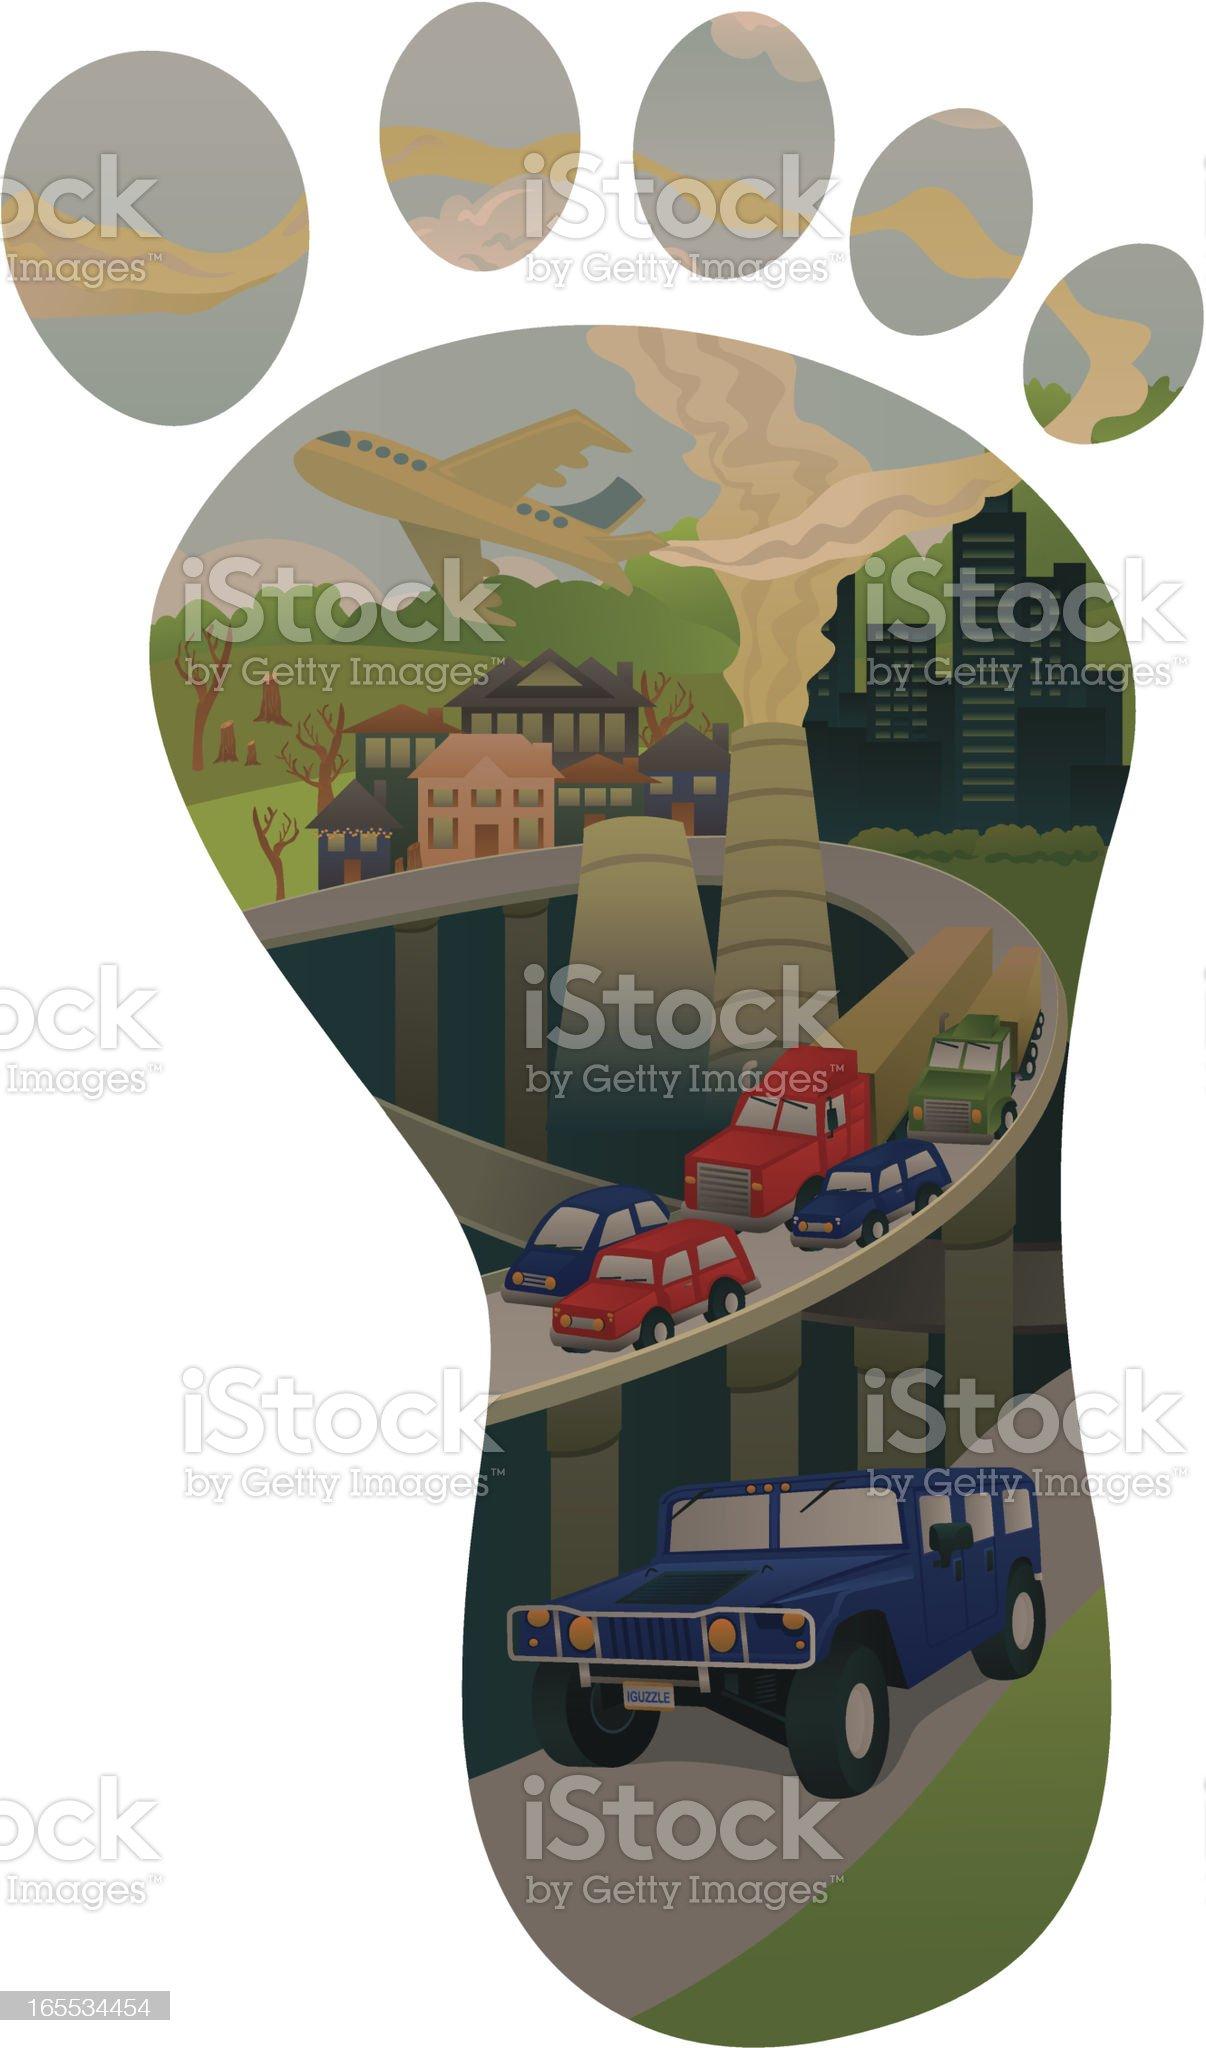 Carbon footprint concept, illustration royalty-free stock vector art